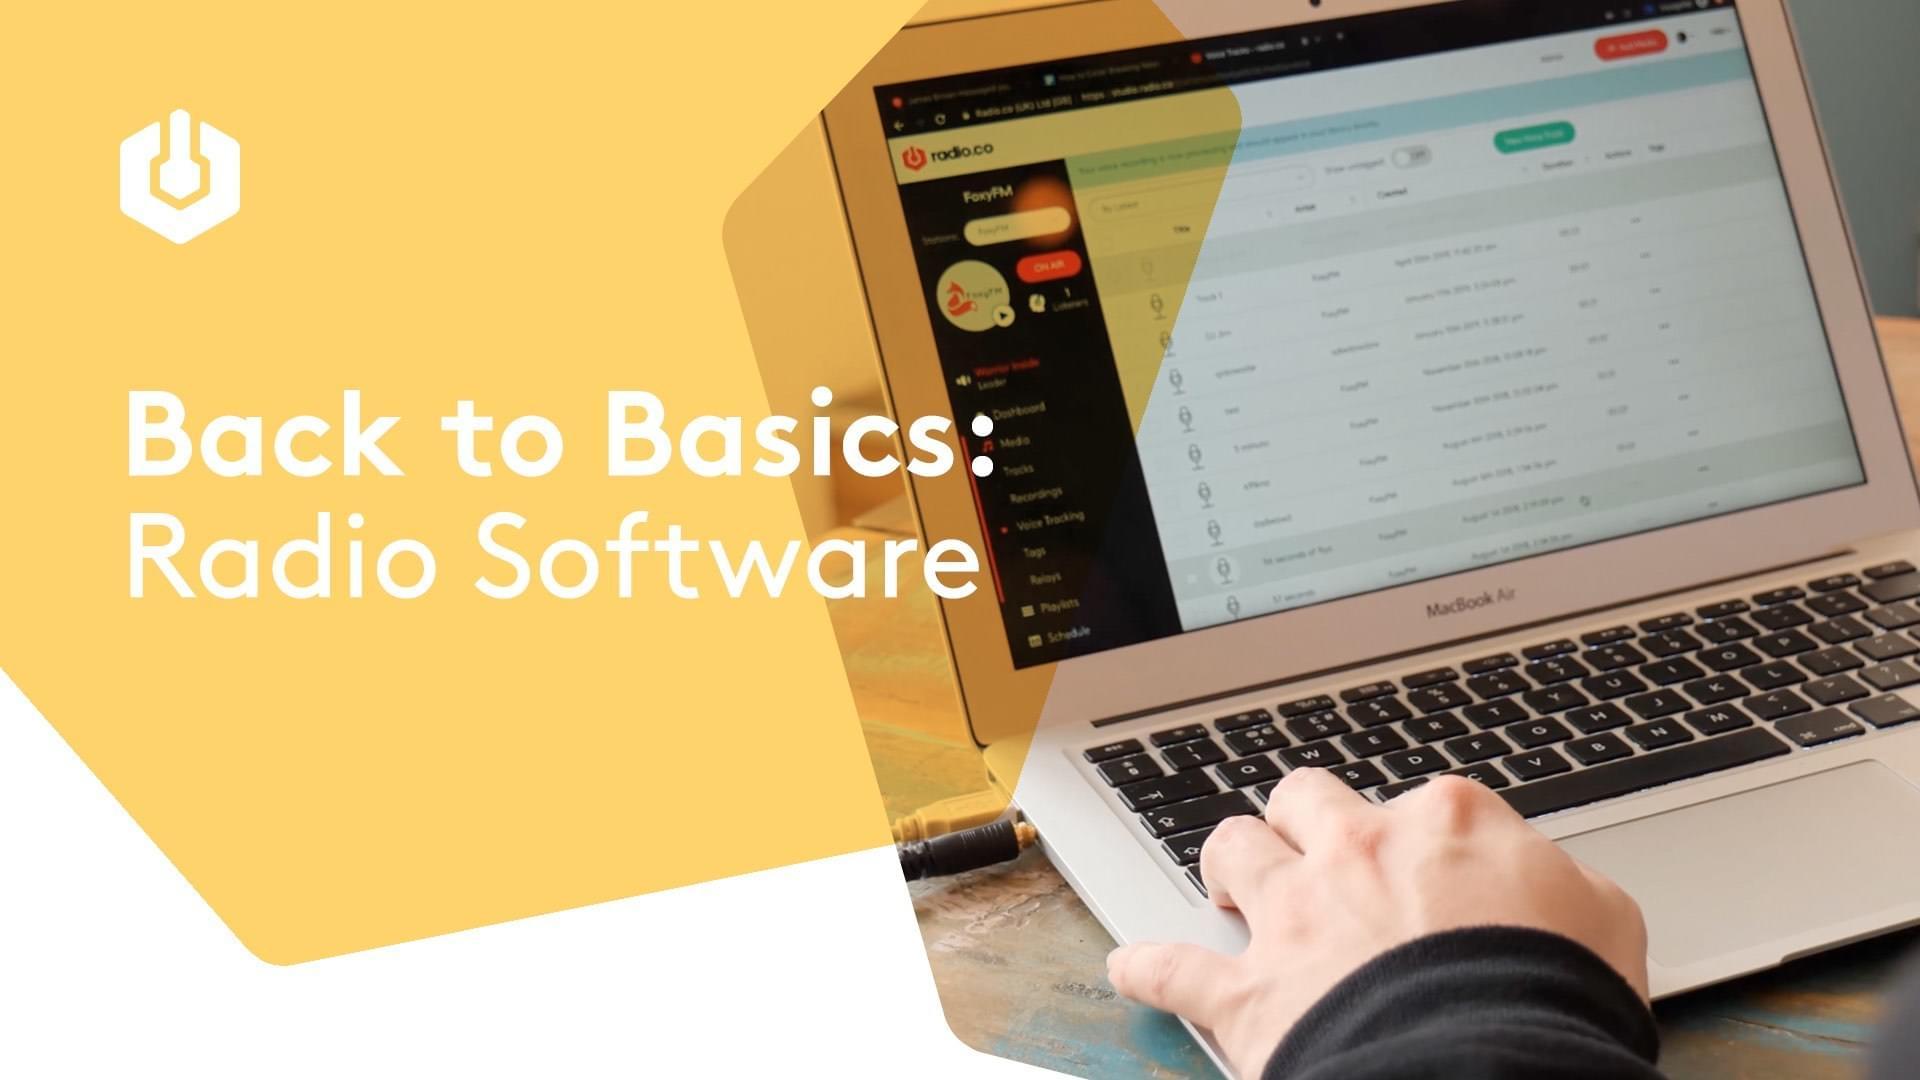 Back To Basics Radio Software Thumbnail